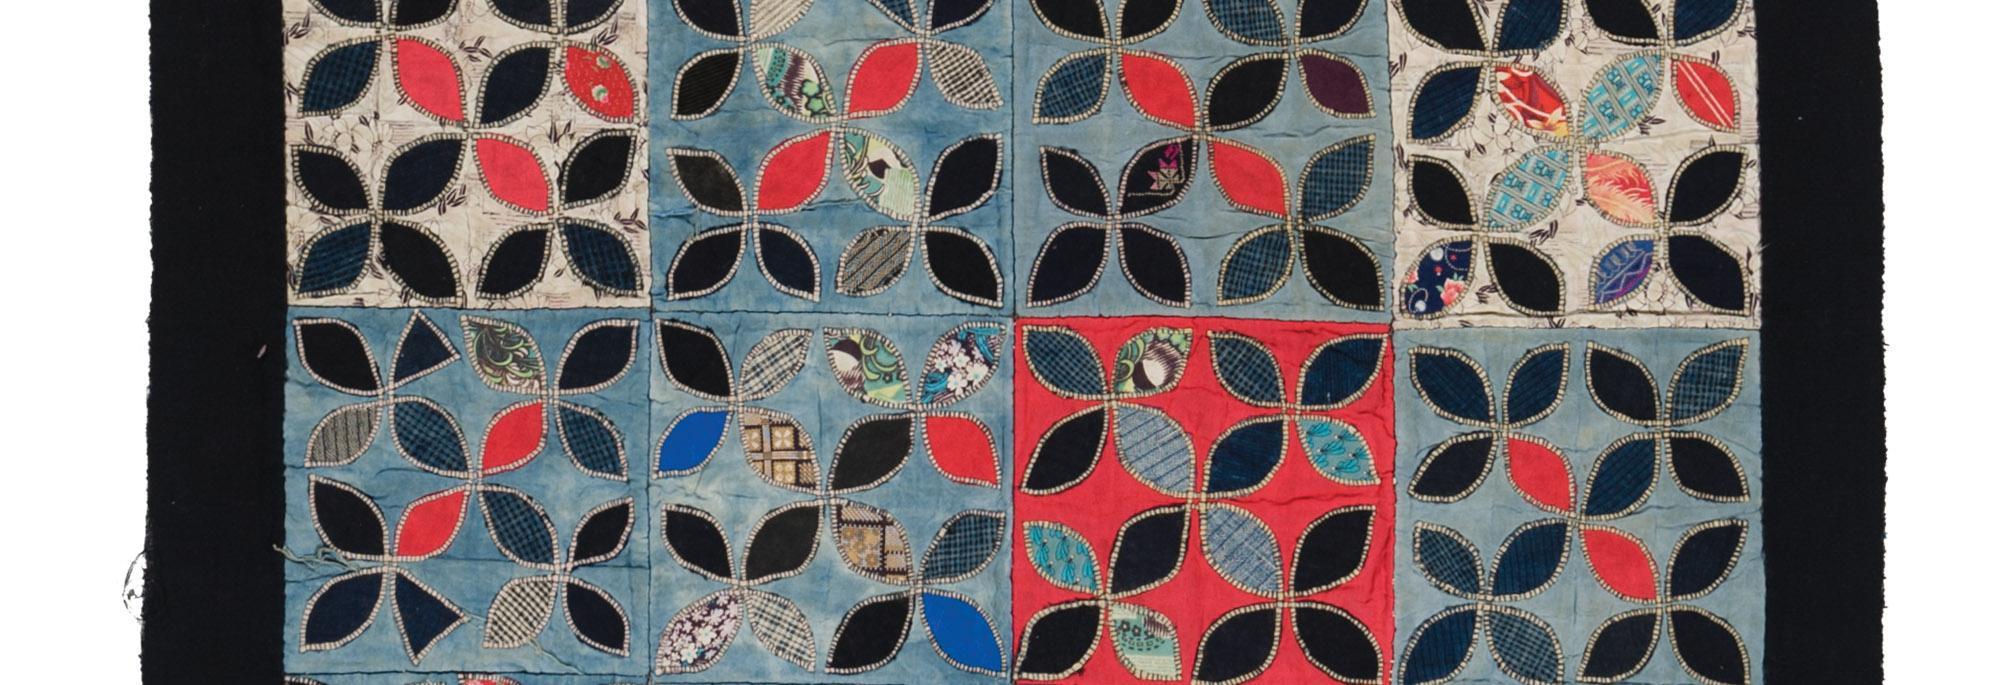 Wedding Quilt Cover - Southwest China